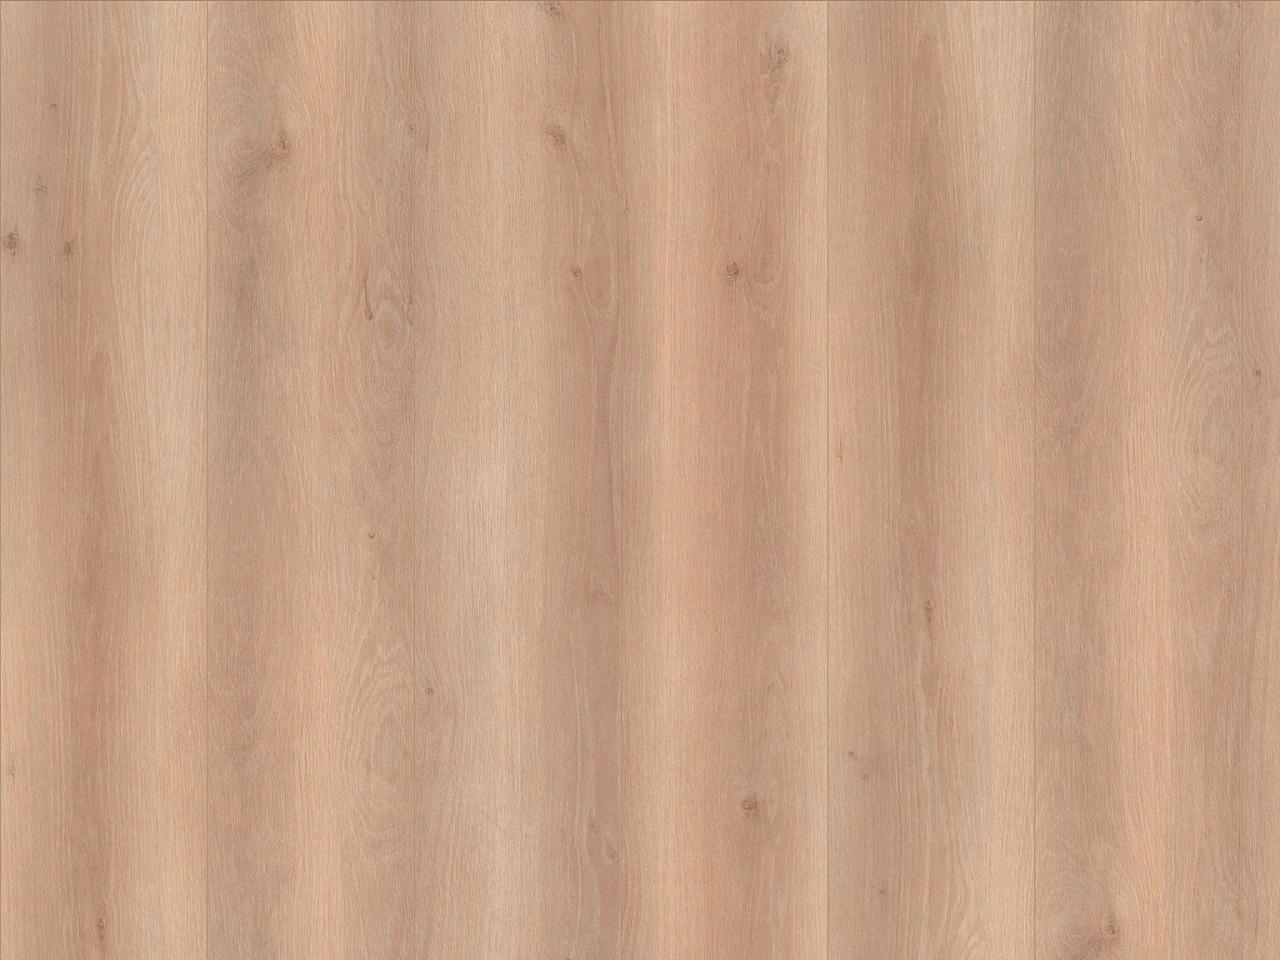 Laminatboden Oak Gallery Format L – Calm Oak beige, LV4165